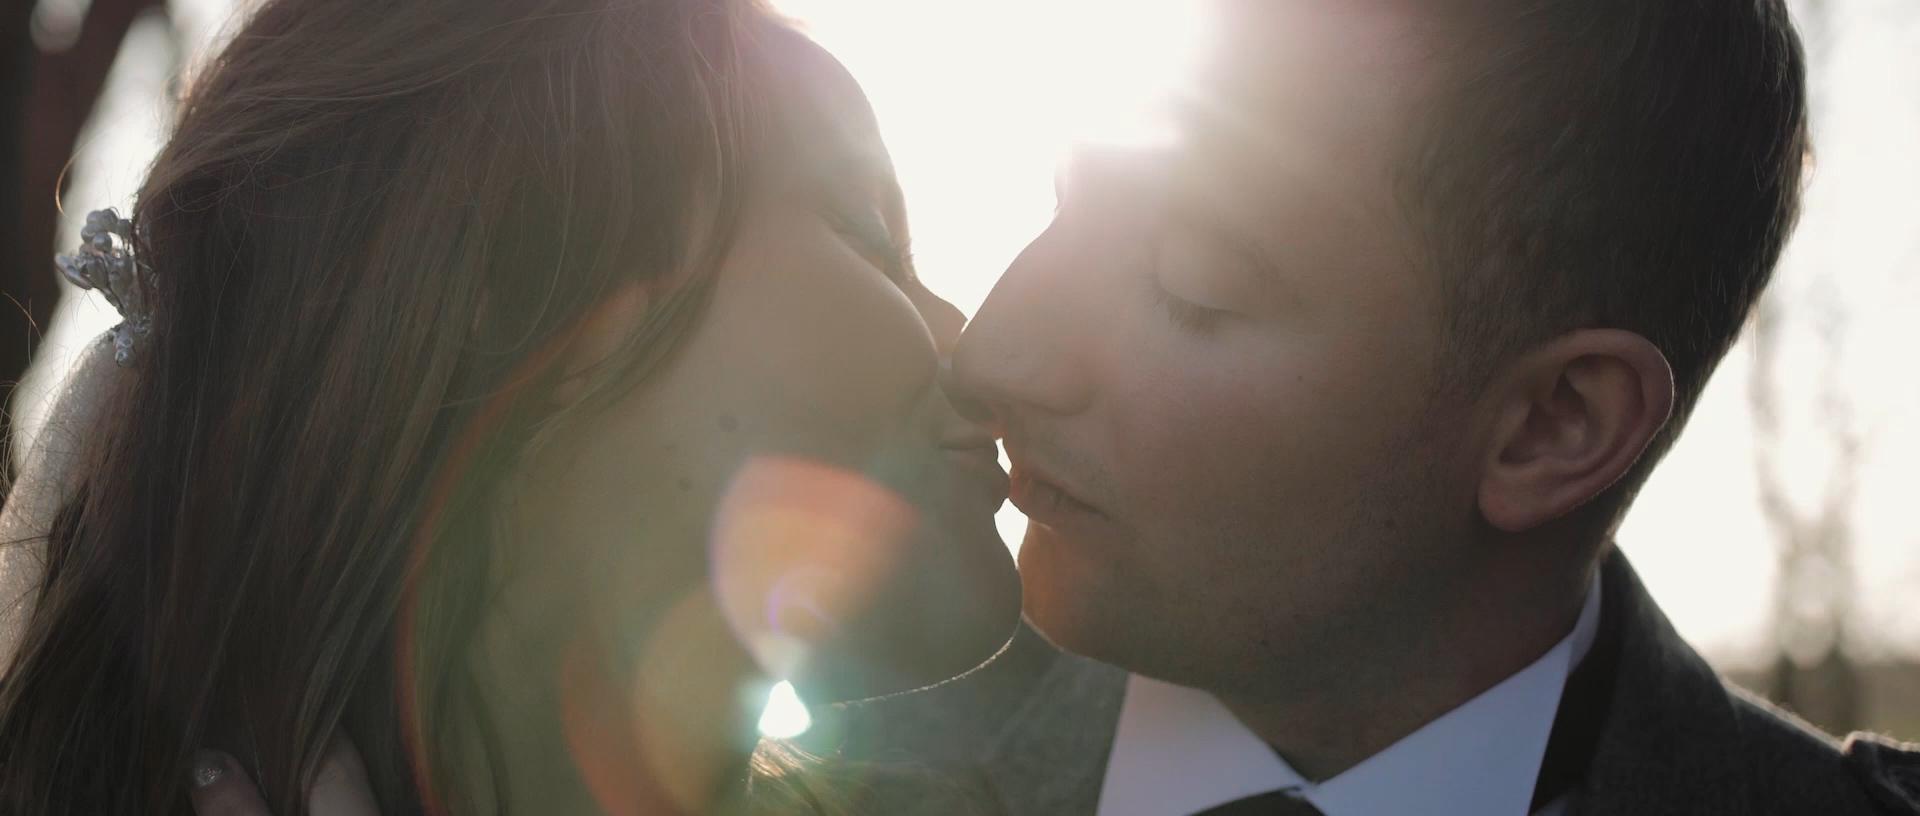 oswald-house-hotel-wedding-videographer_LL_03.jpg